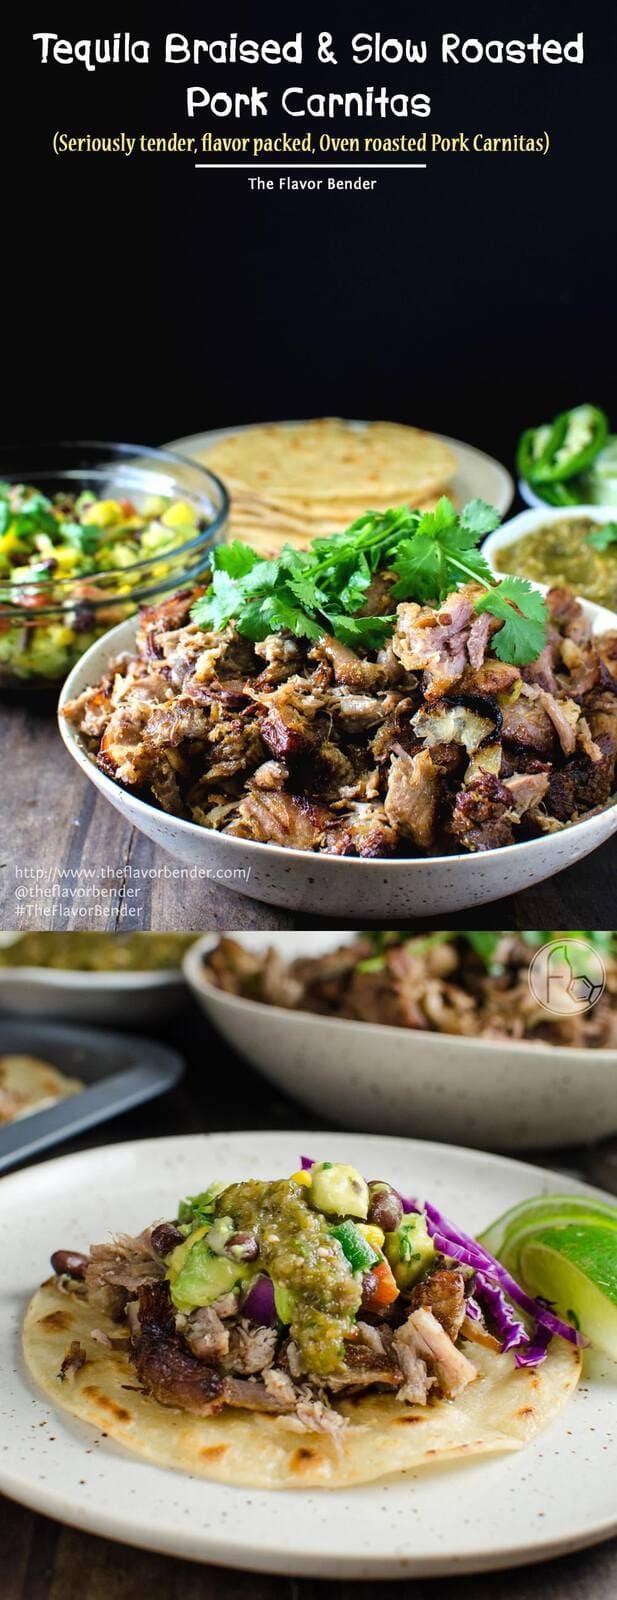 how to cook pork carnitas